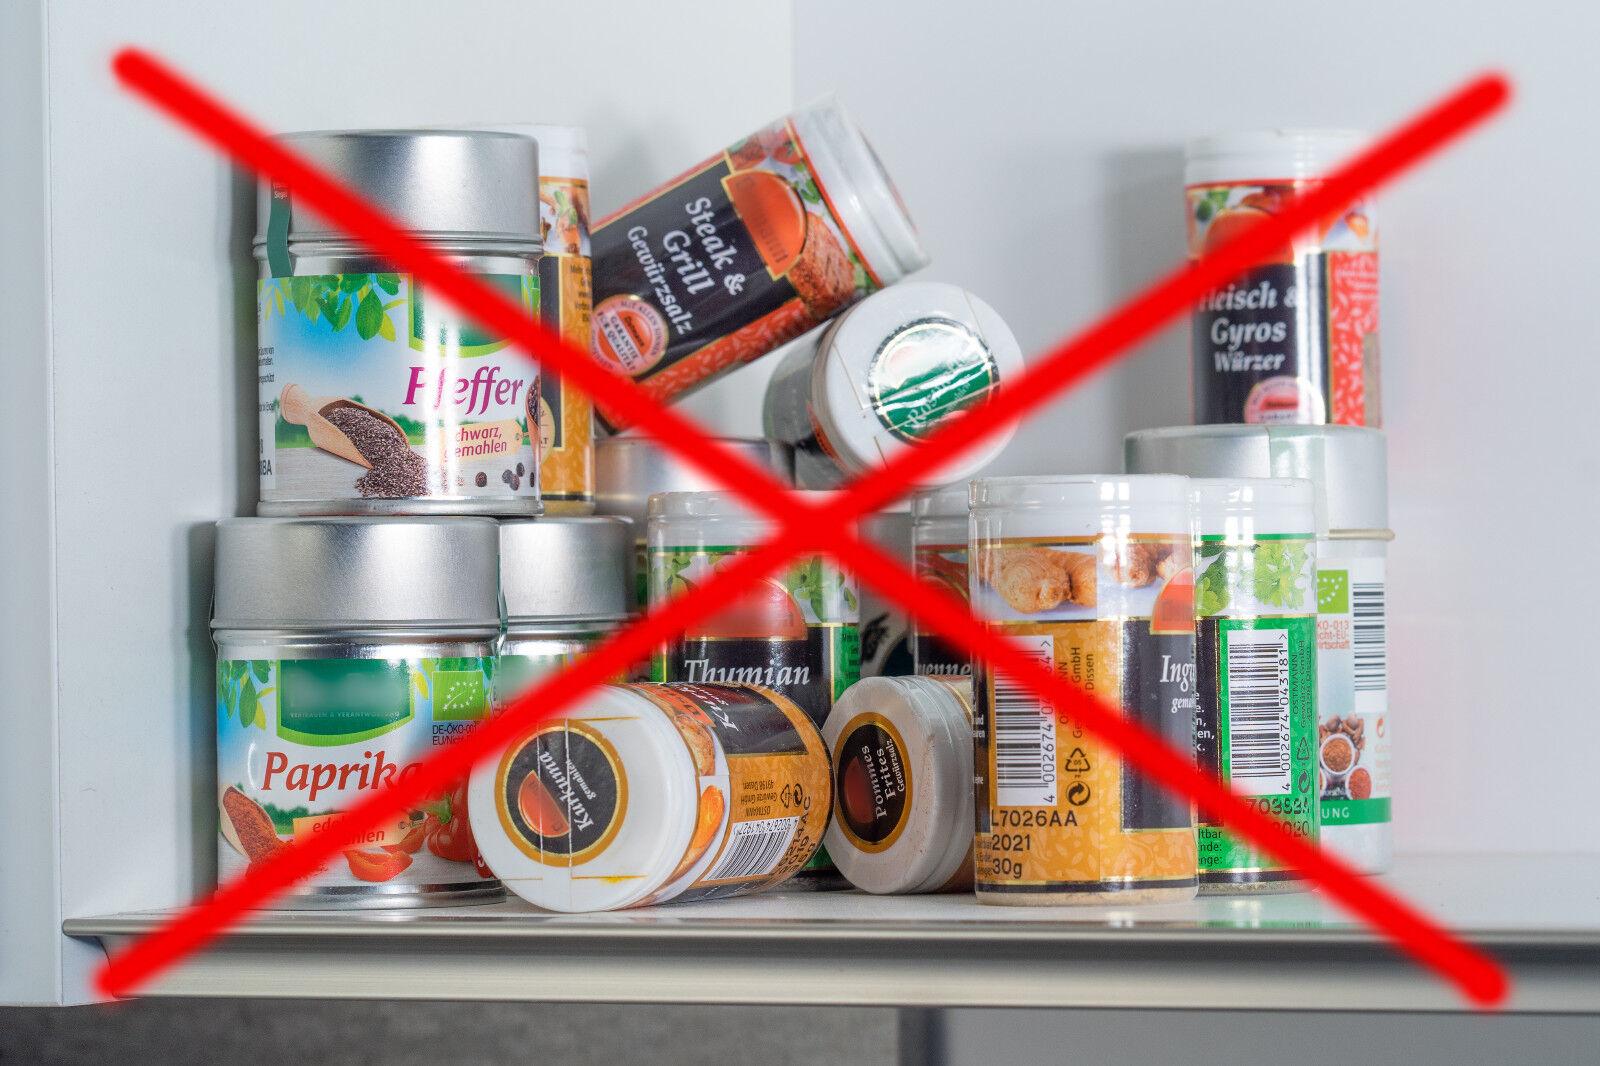 Upp Gewurzregal Ausziehbar Medikamenten Regal Kuchen Ordnungssystem Bad Orga Ebay